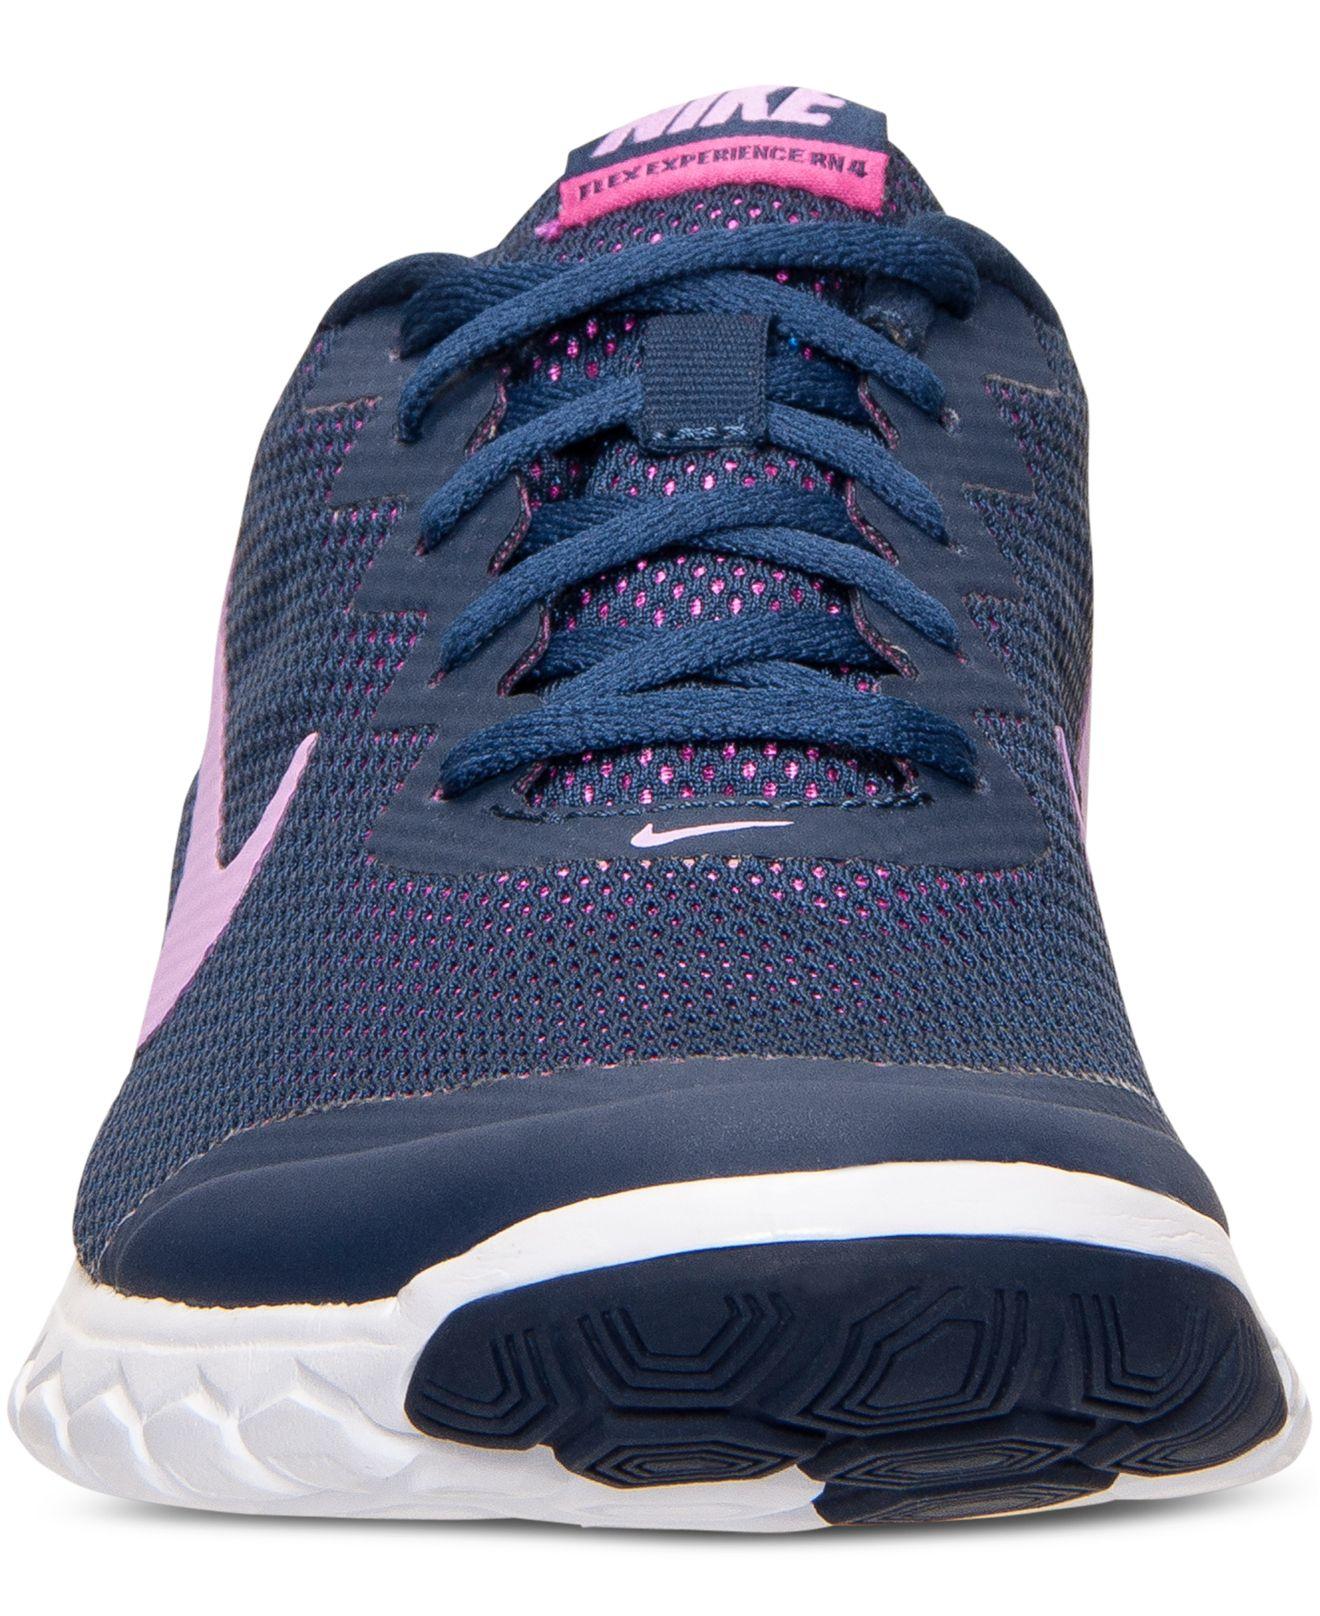 Copuon Womens Nike Roshe Run Shoes Deep Red Black